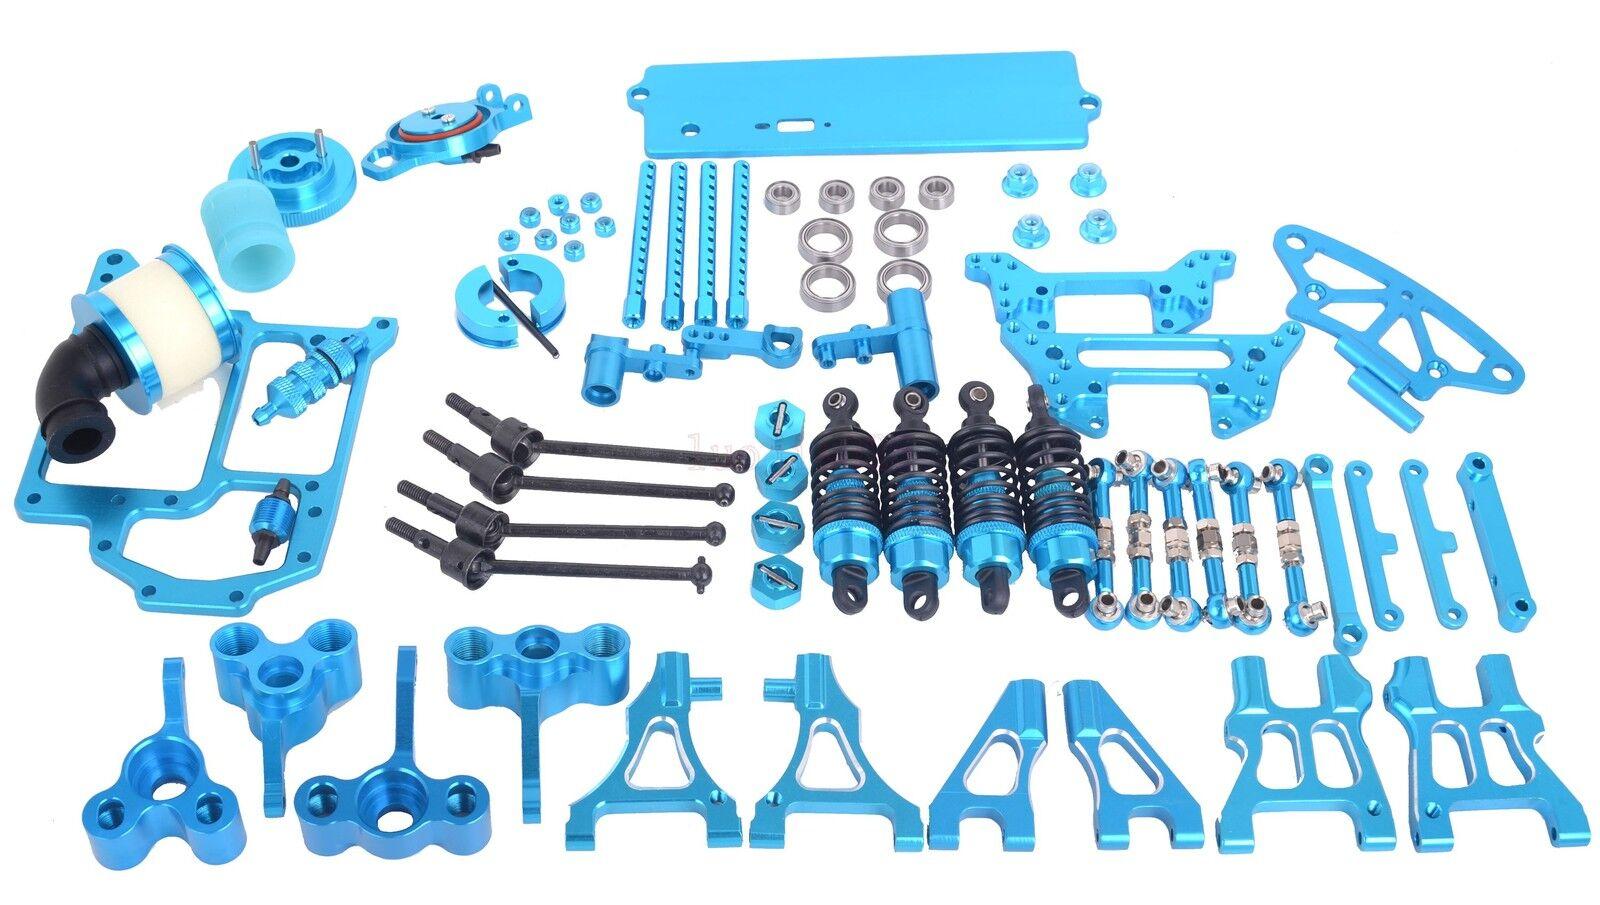 Piezas de actualización combinar Azul Para Hsp Nitro Rc 1 10 de carretera coche Xstr 94122